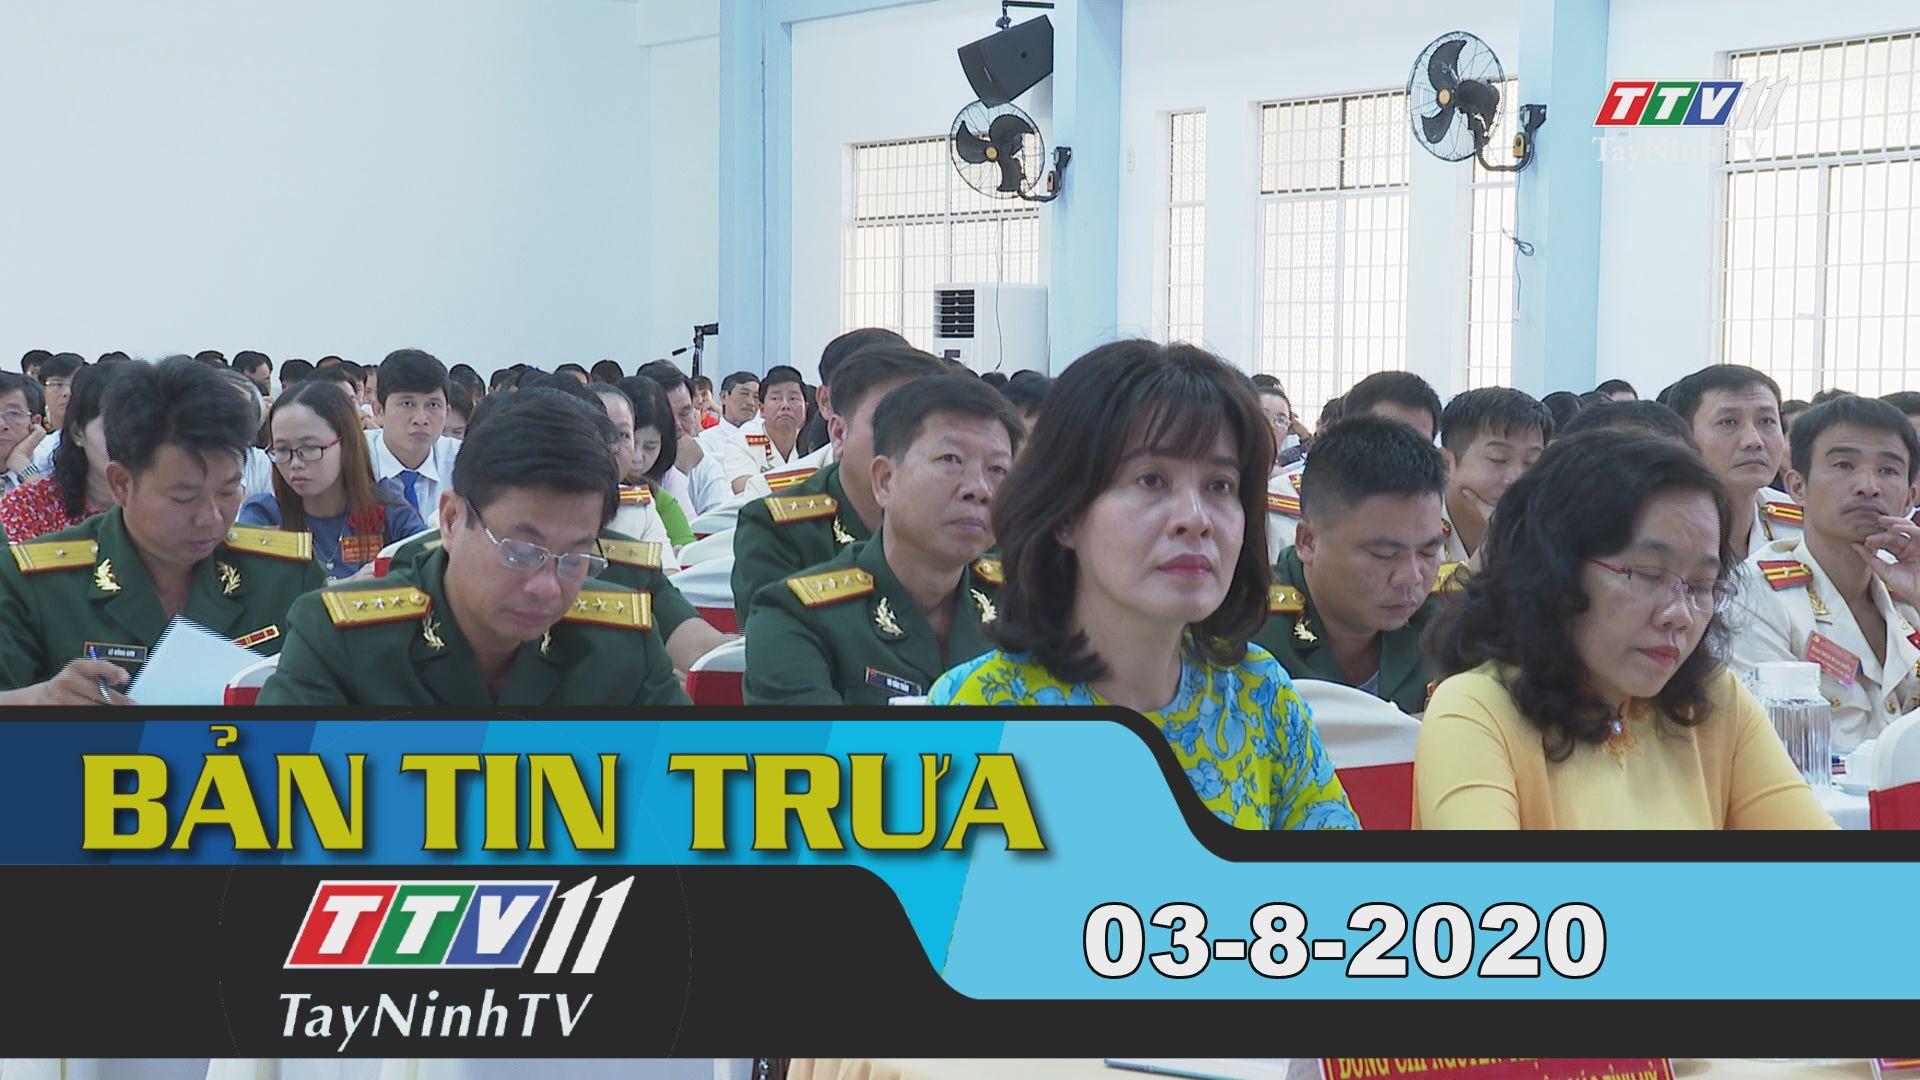 Bản tin trưa 03-8-2020 | Tin tức hôm nay | TayNinhTV